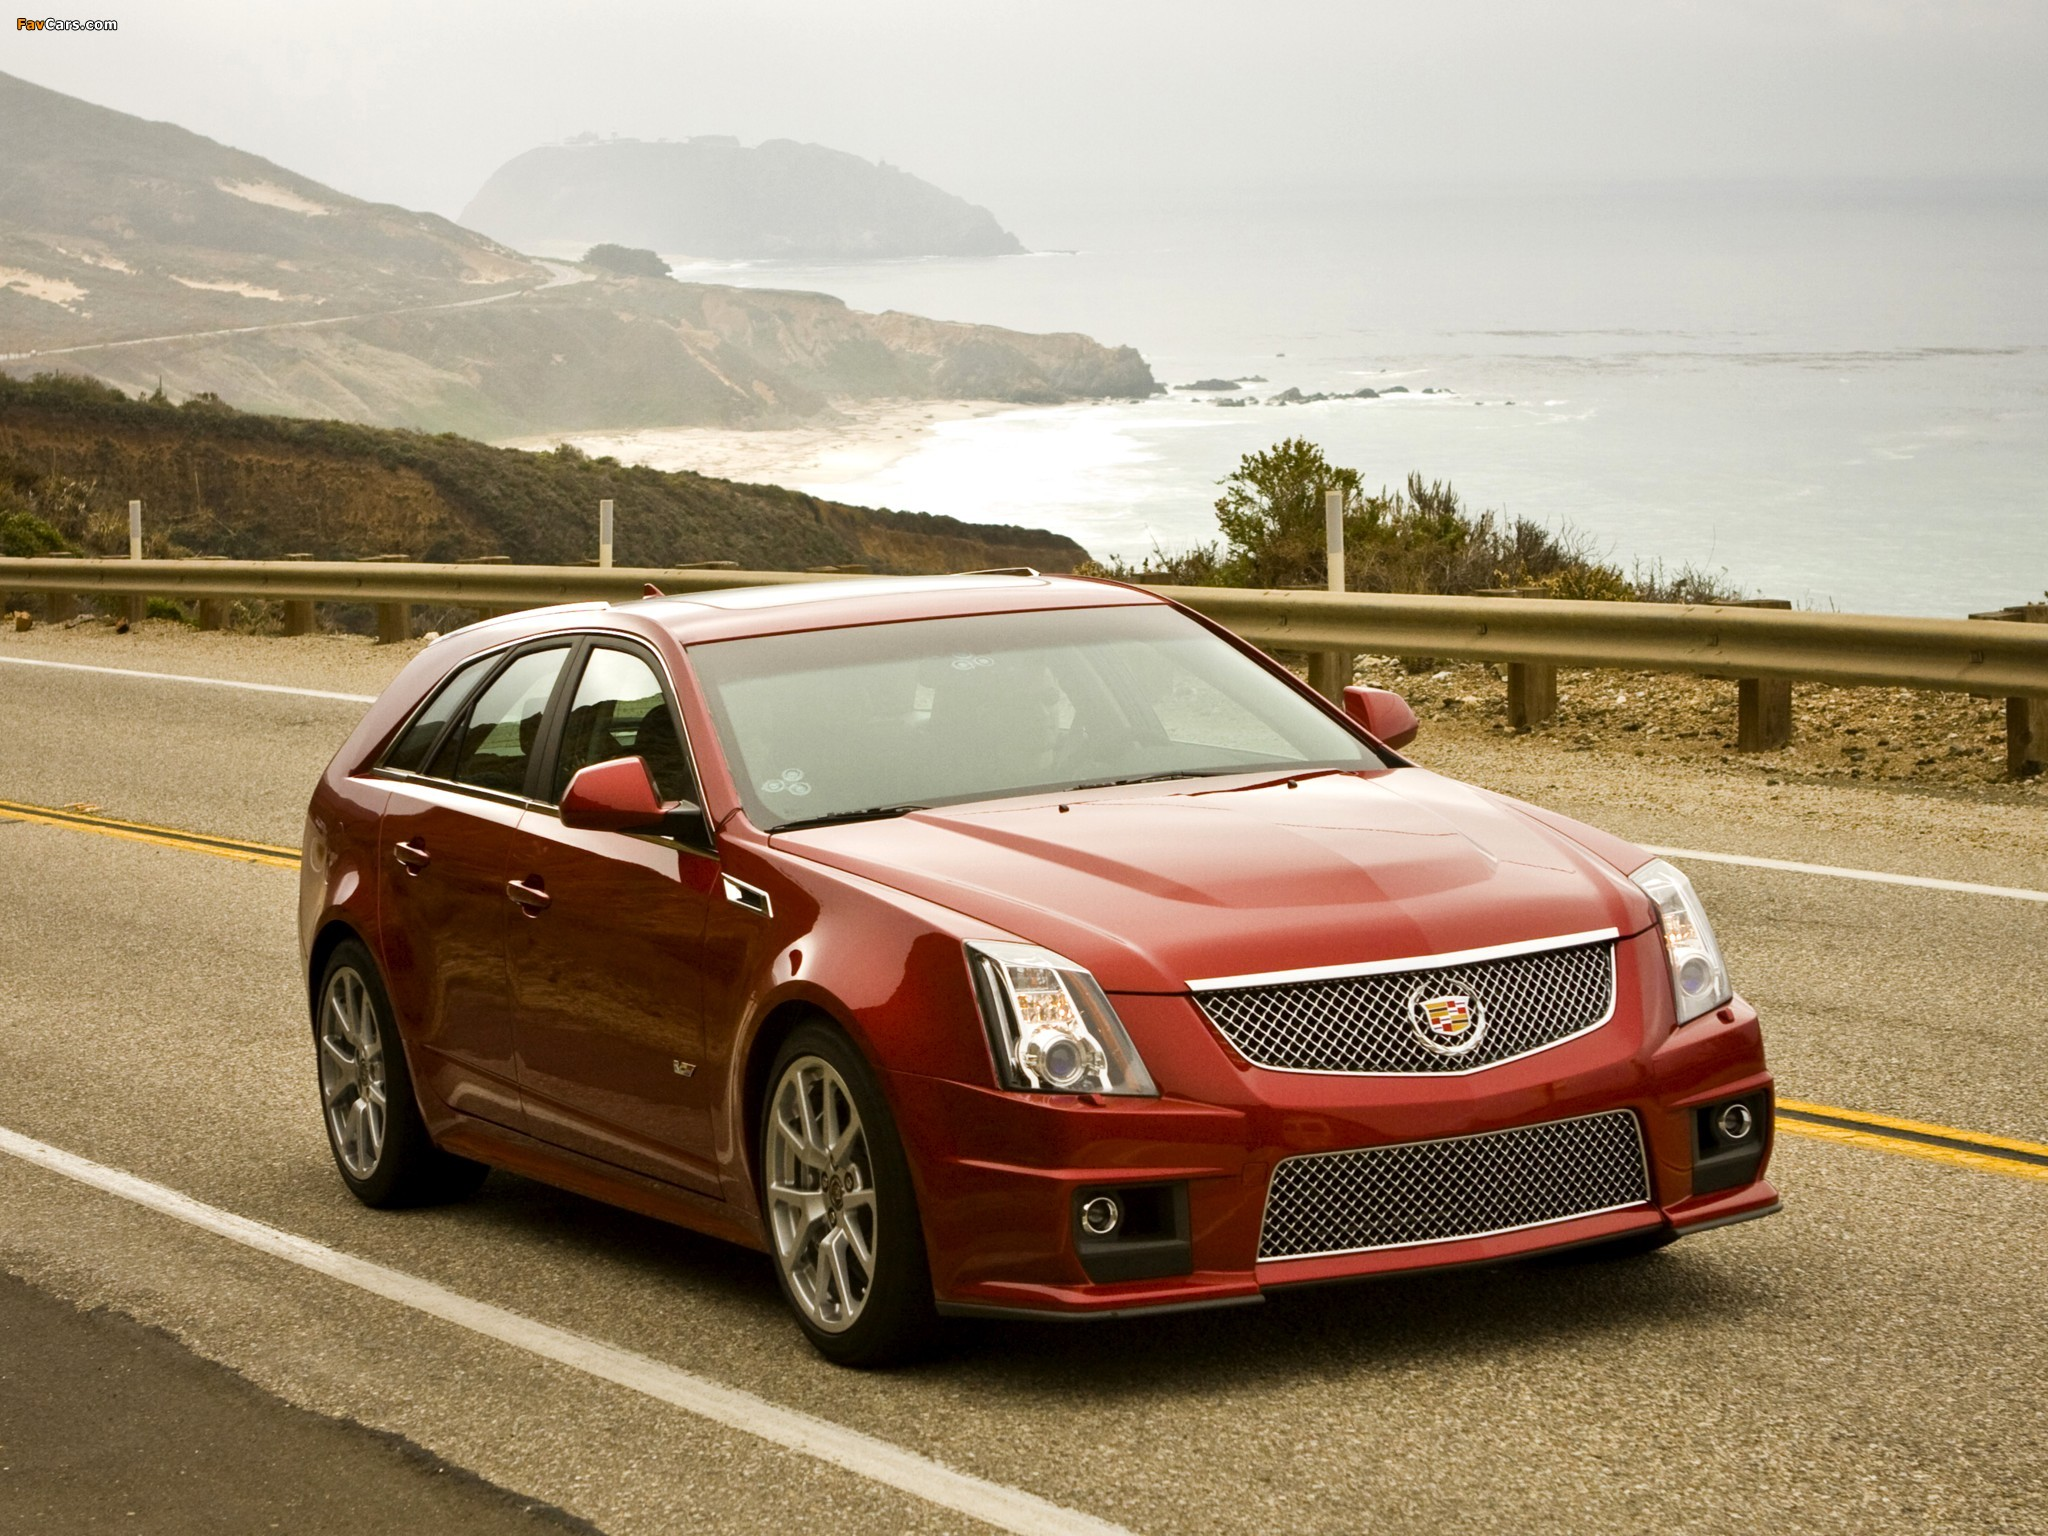 Cadillac CTS-V Sport Wagon 2010 photos (2048 x 1536)